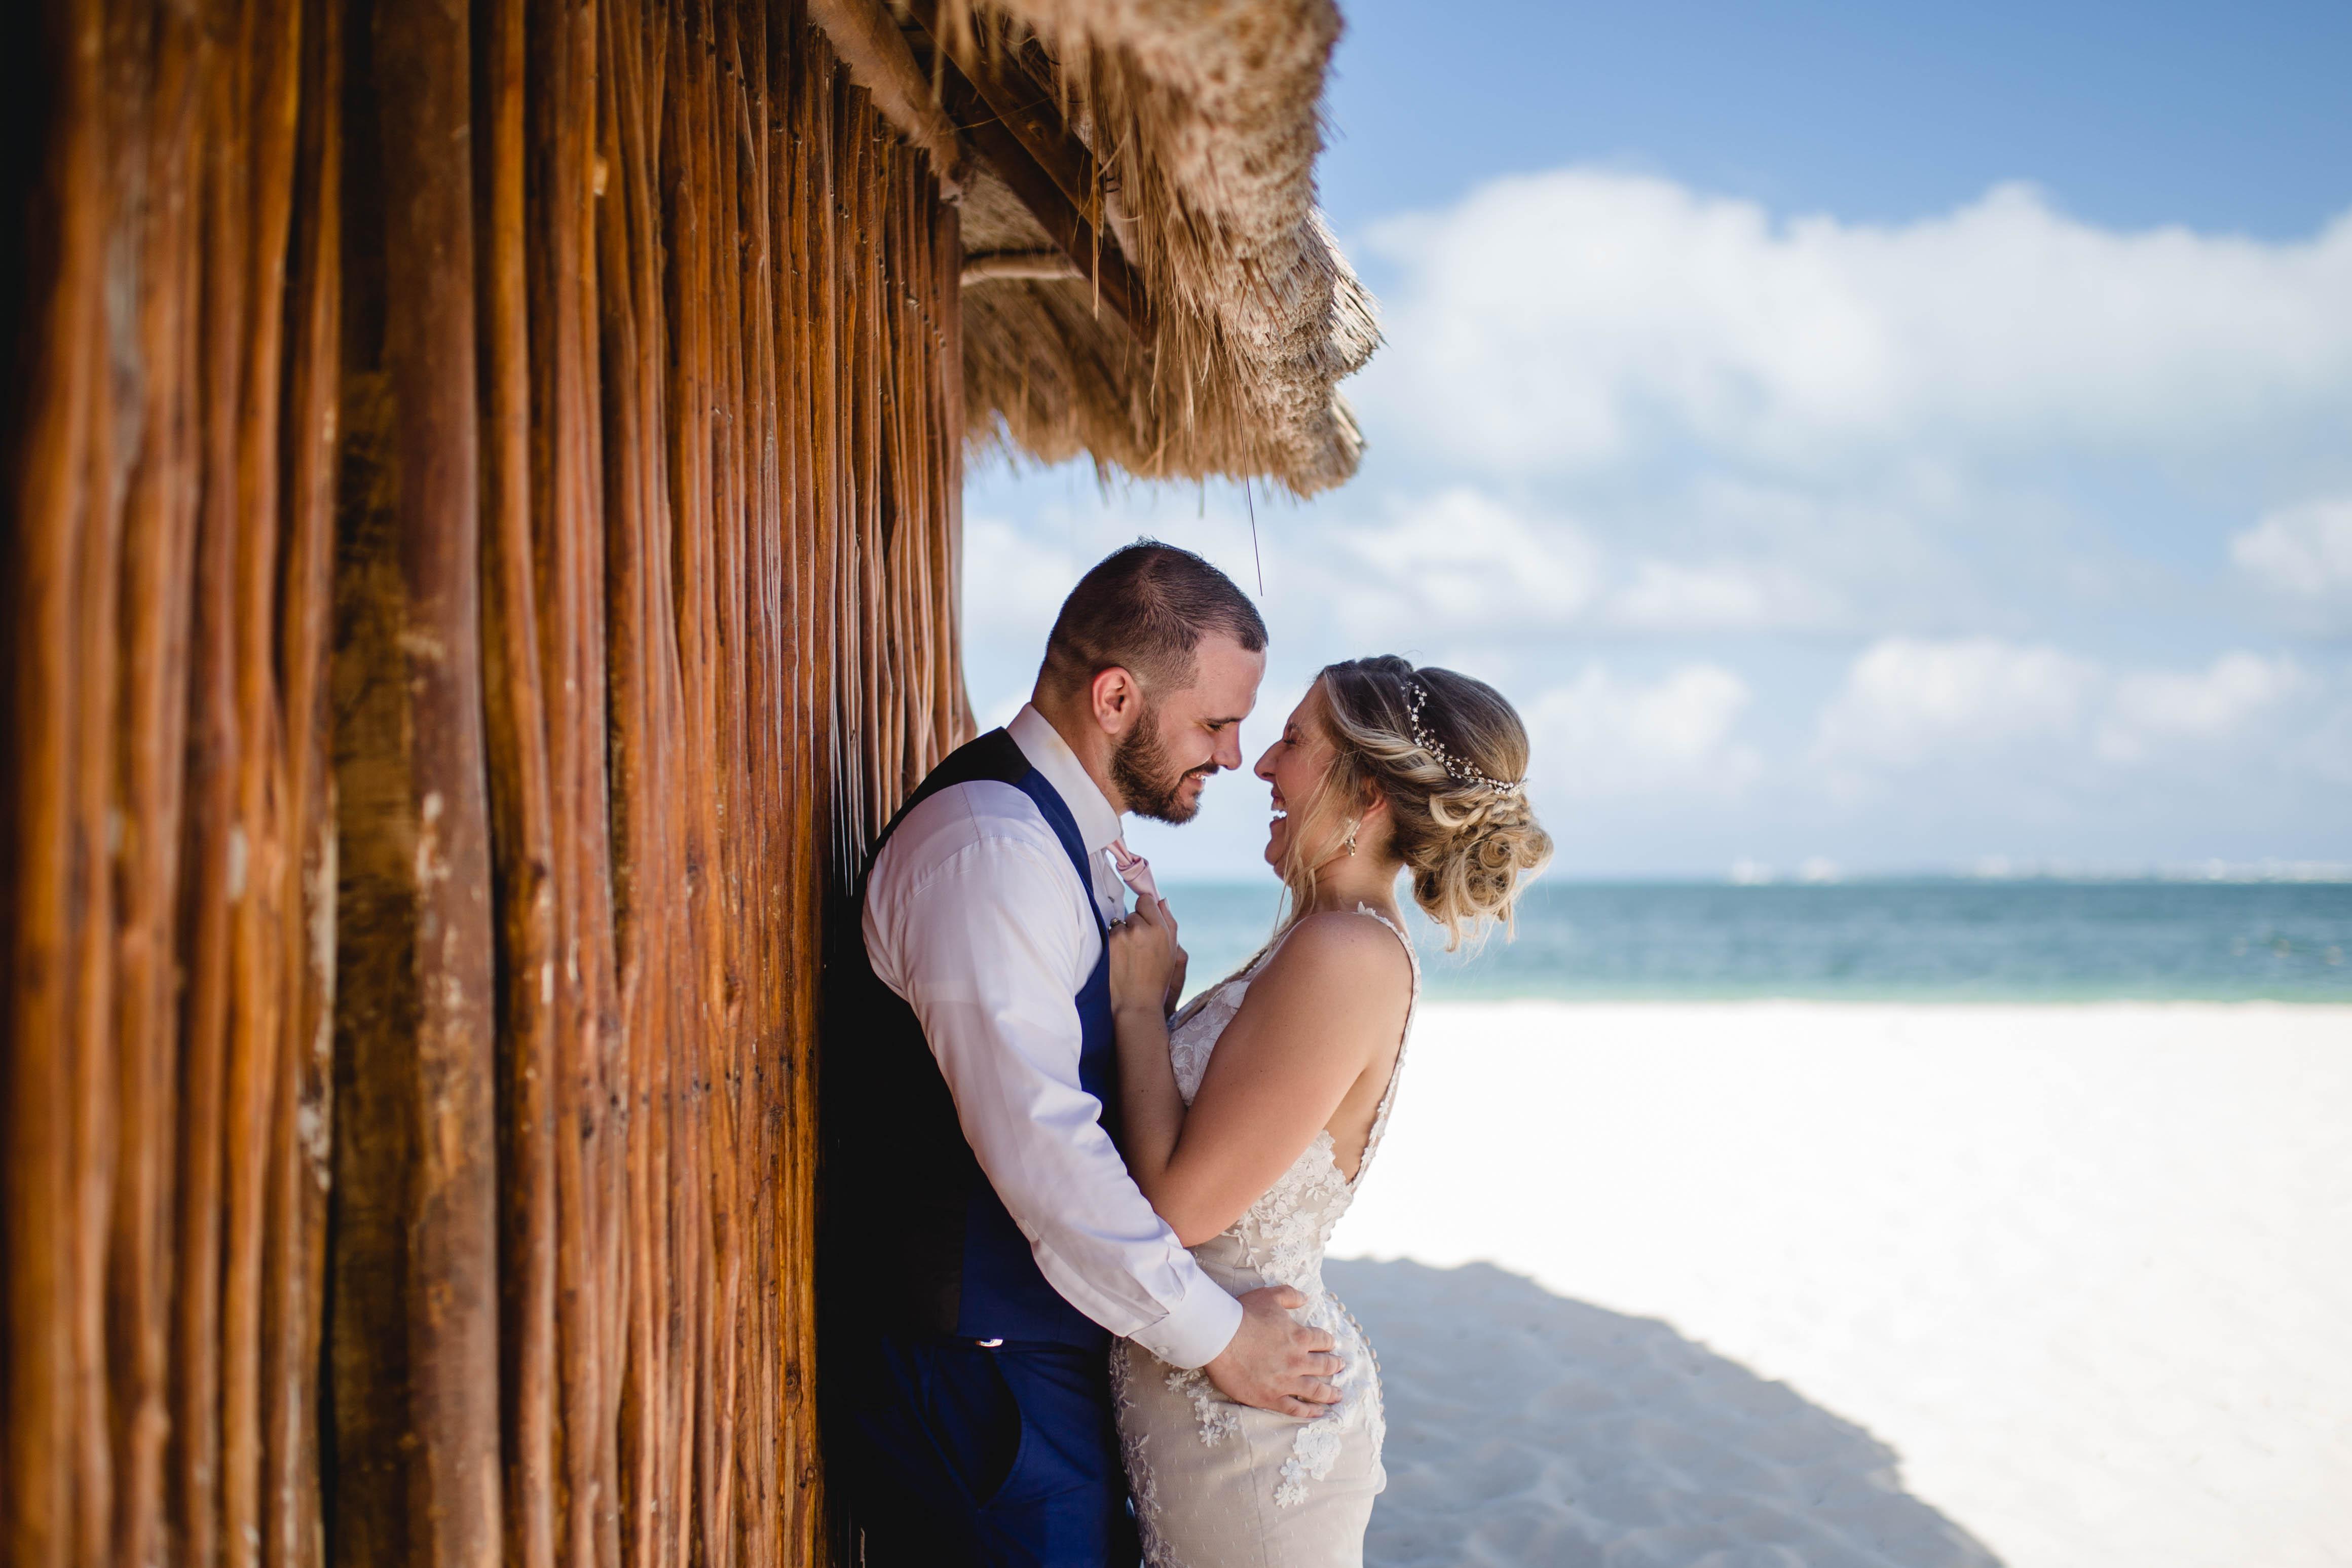 Amanda + Bill | Cancún, Mexico | Finest Playa Mujeres